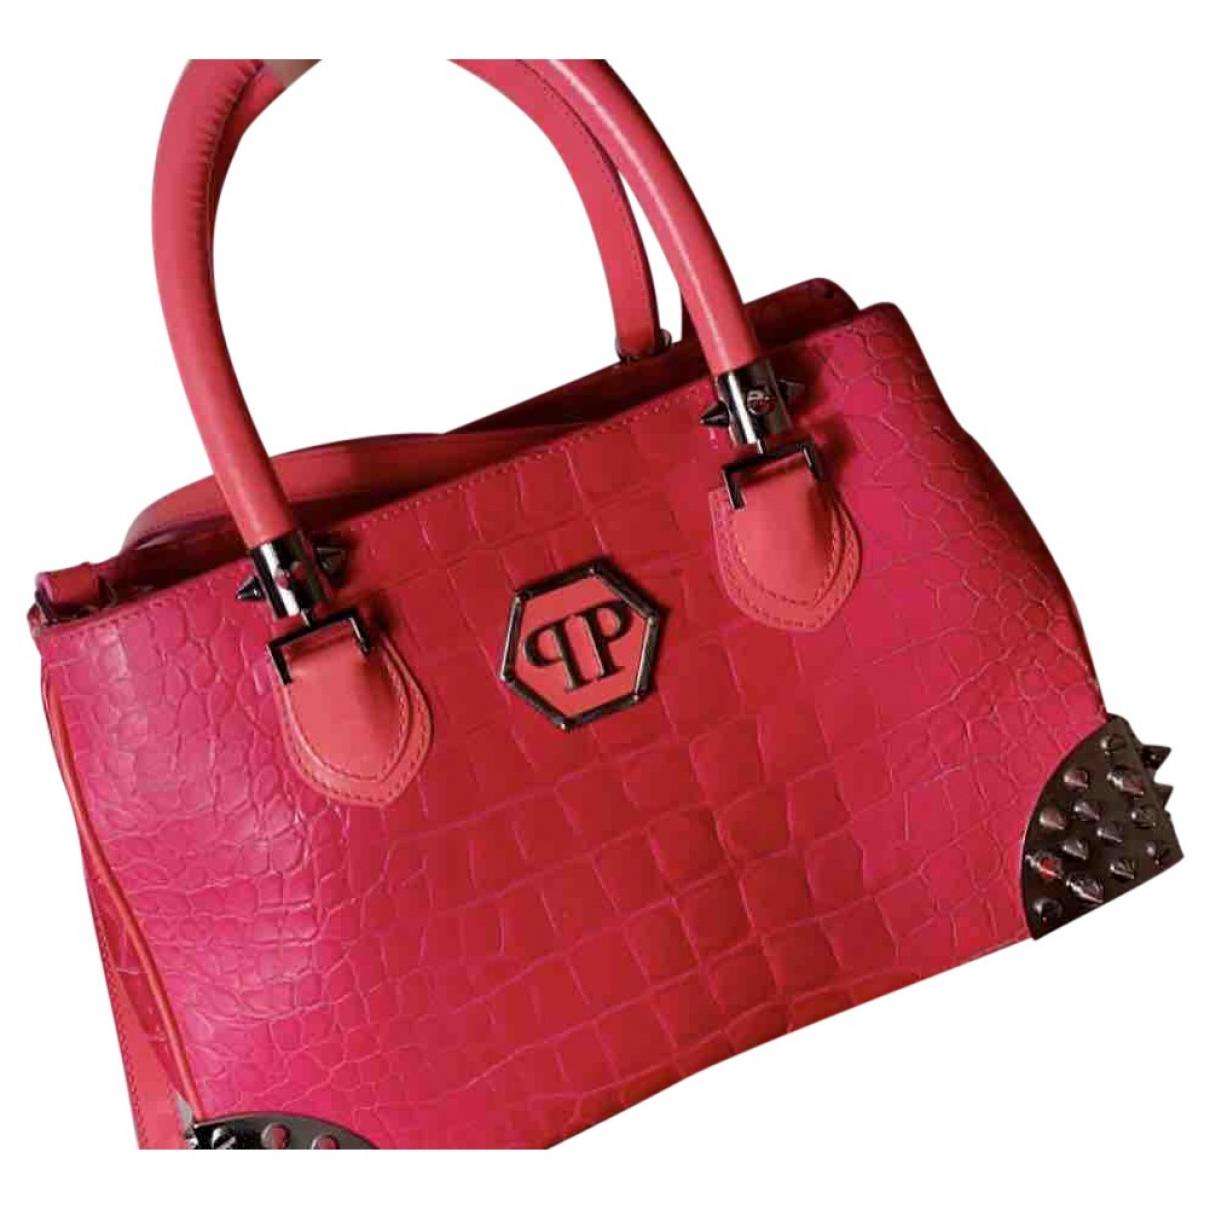 Philipp Plein \N Pink Patent leather handbag for Women \N